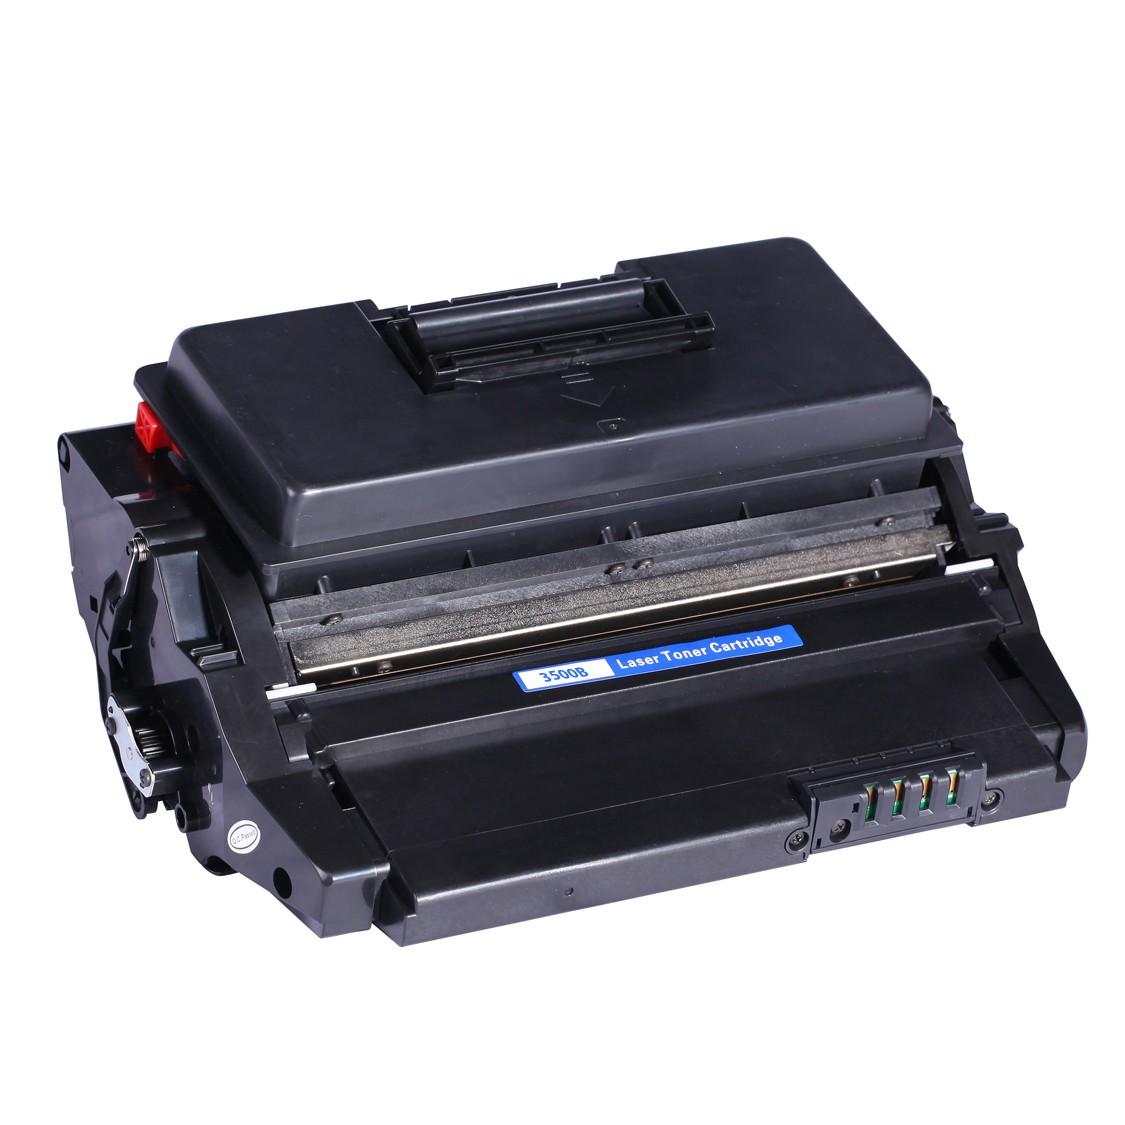 Image of   Xerox 3500B BK (106R01149) Lasertoner, Sort, Kompatibel (12000 sider)